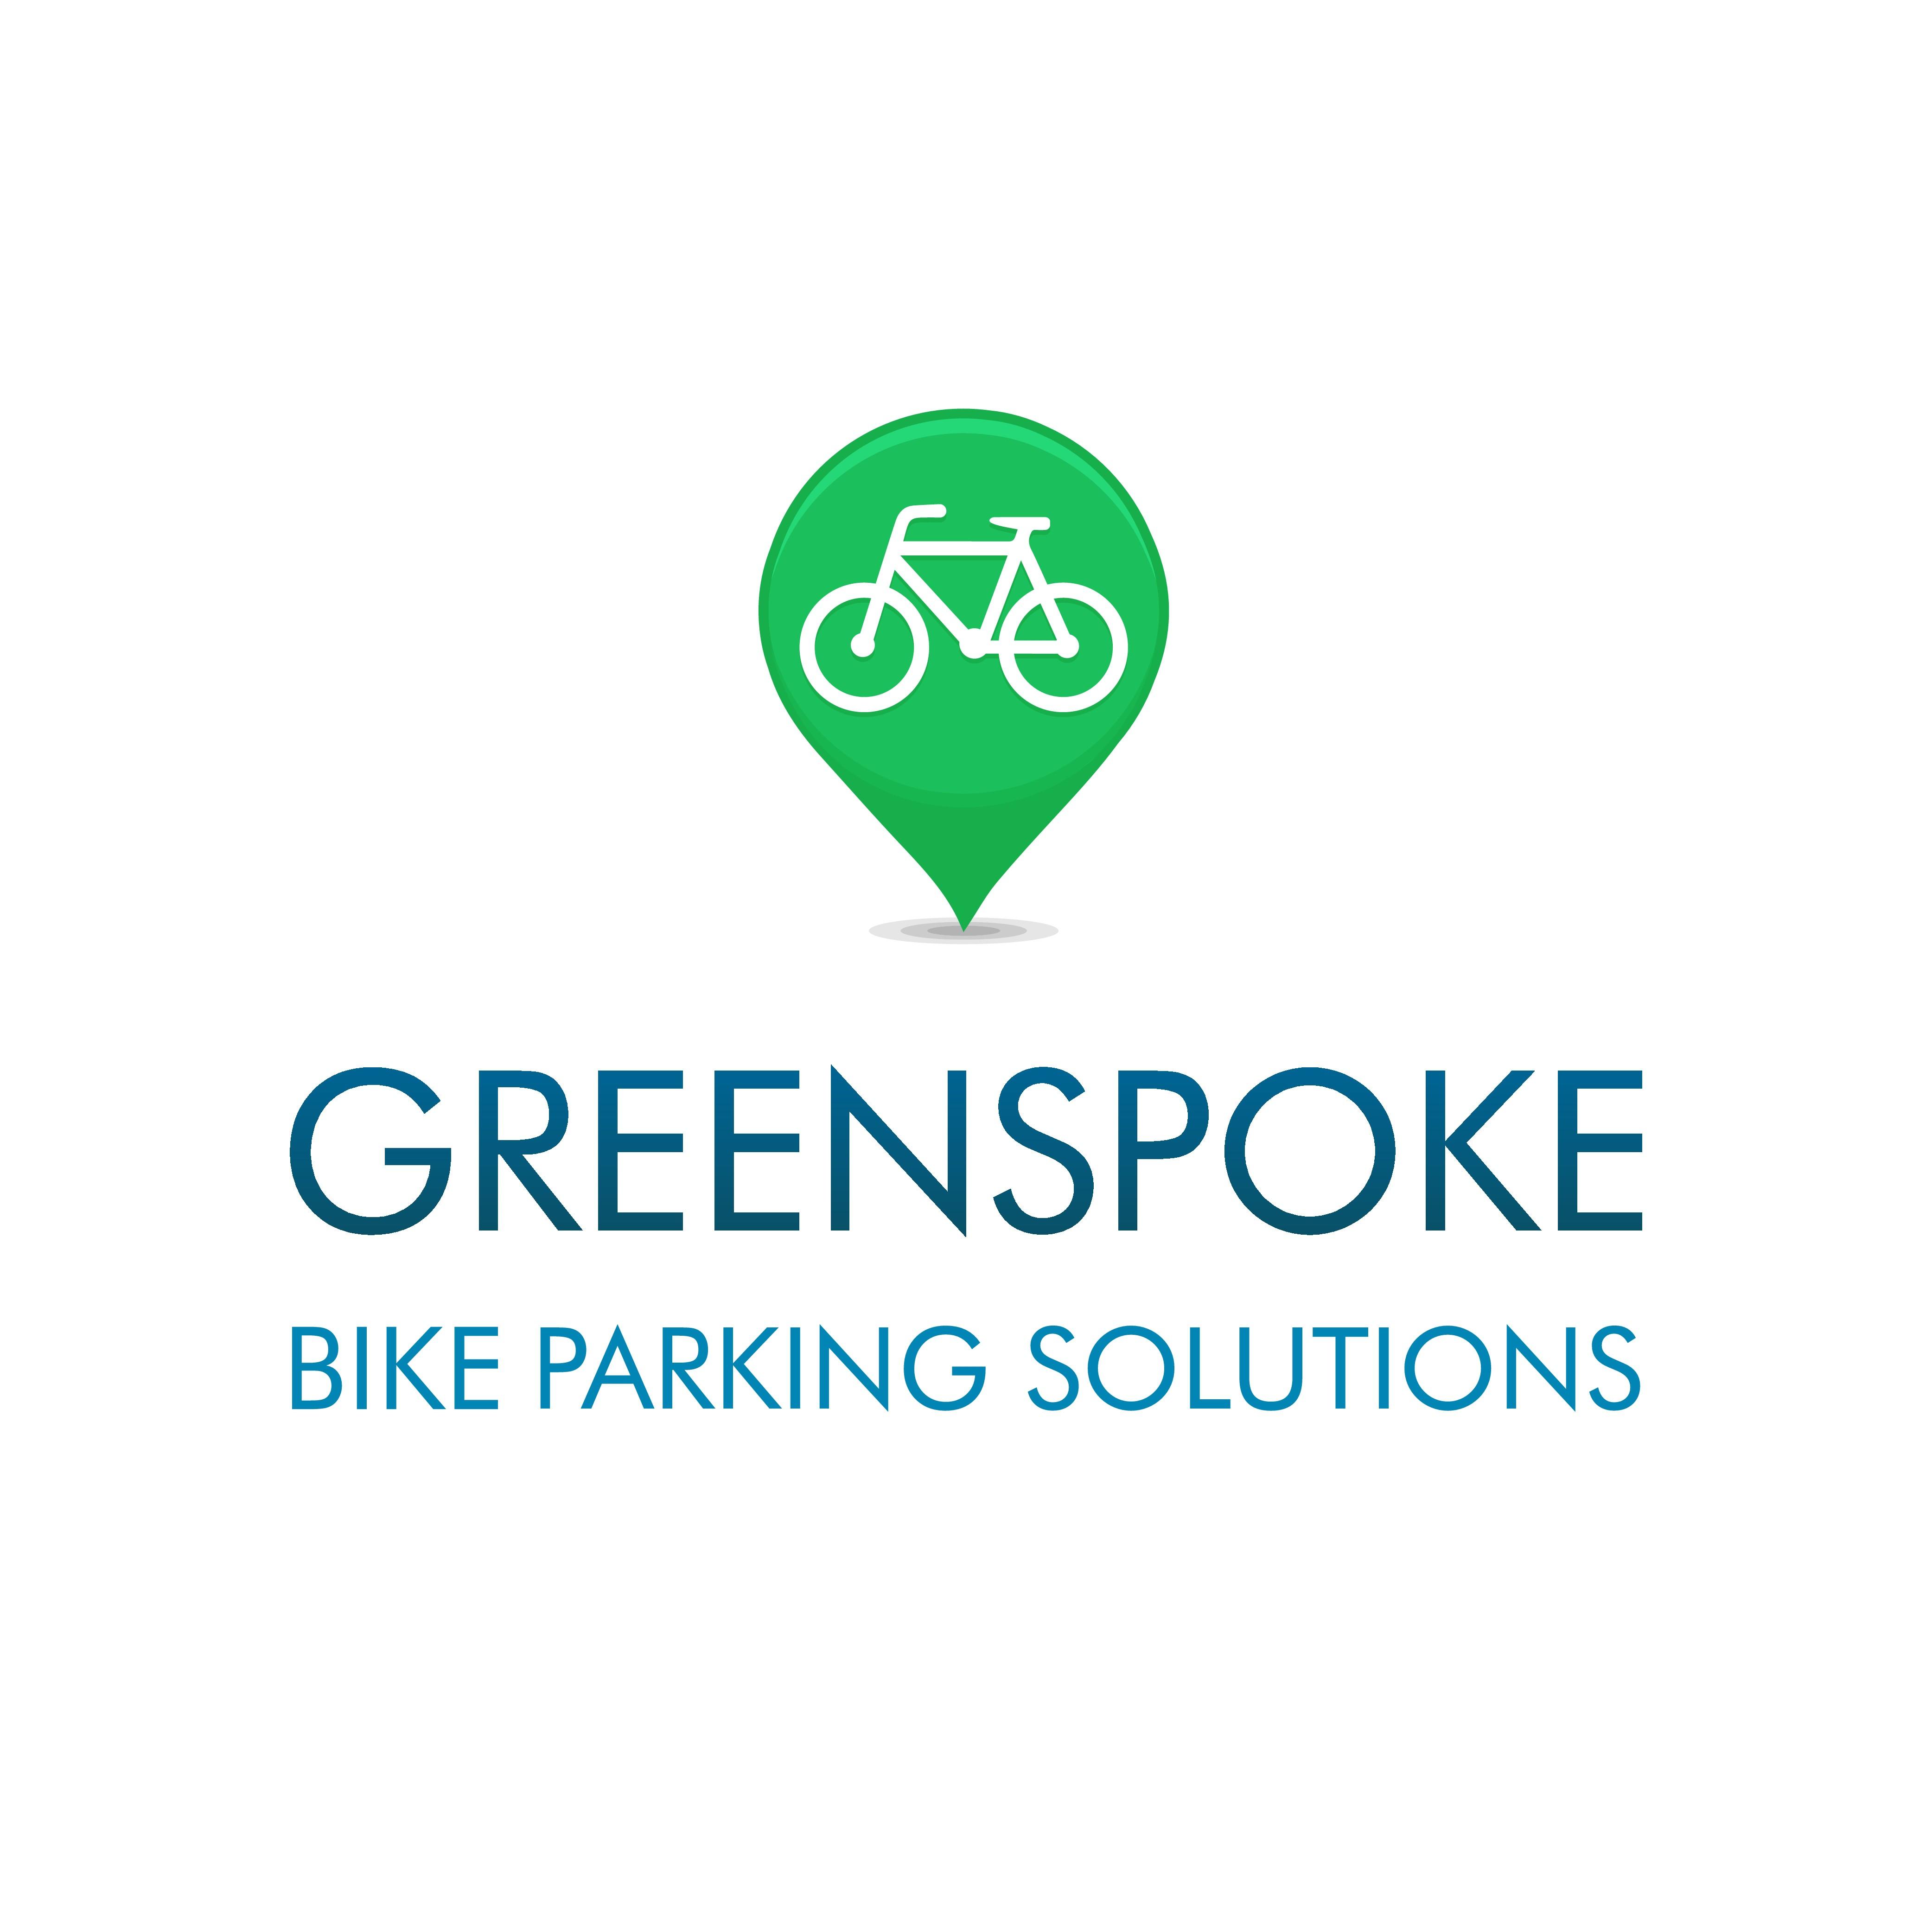 Greenspoke Bike Parking Logo